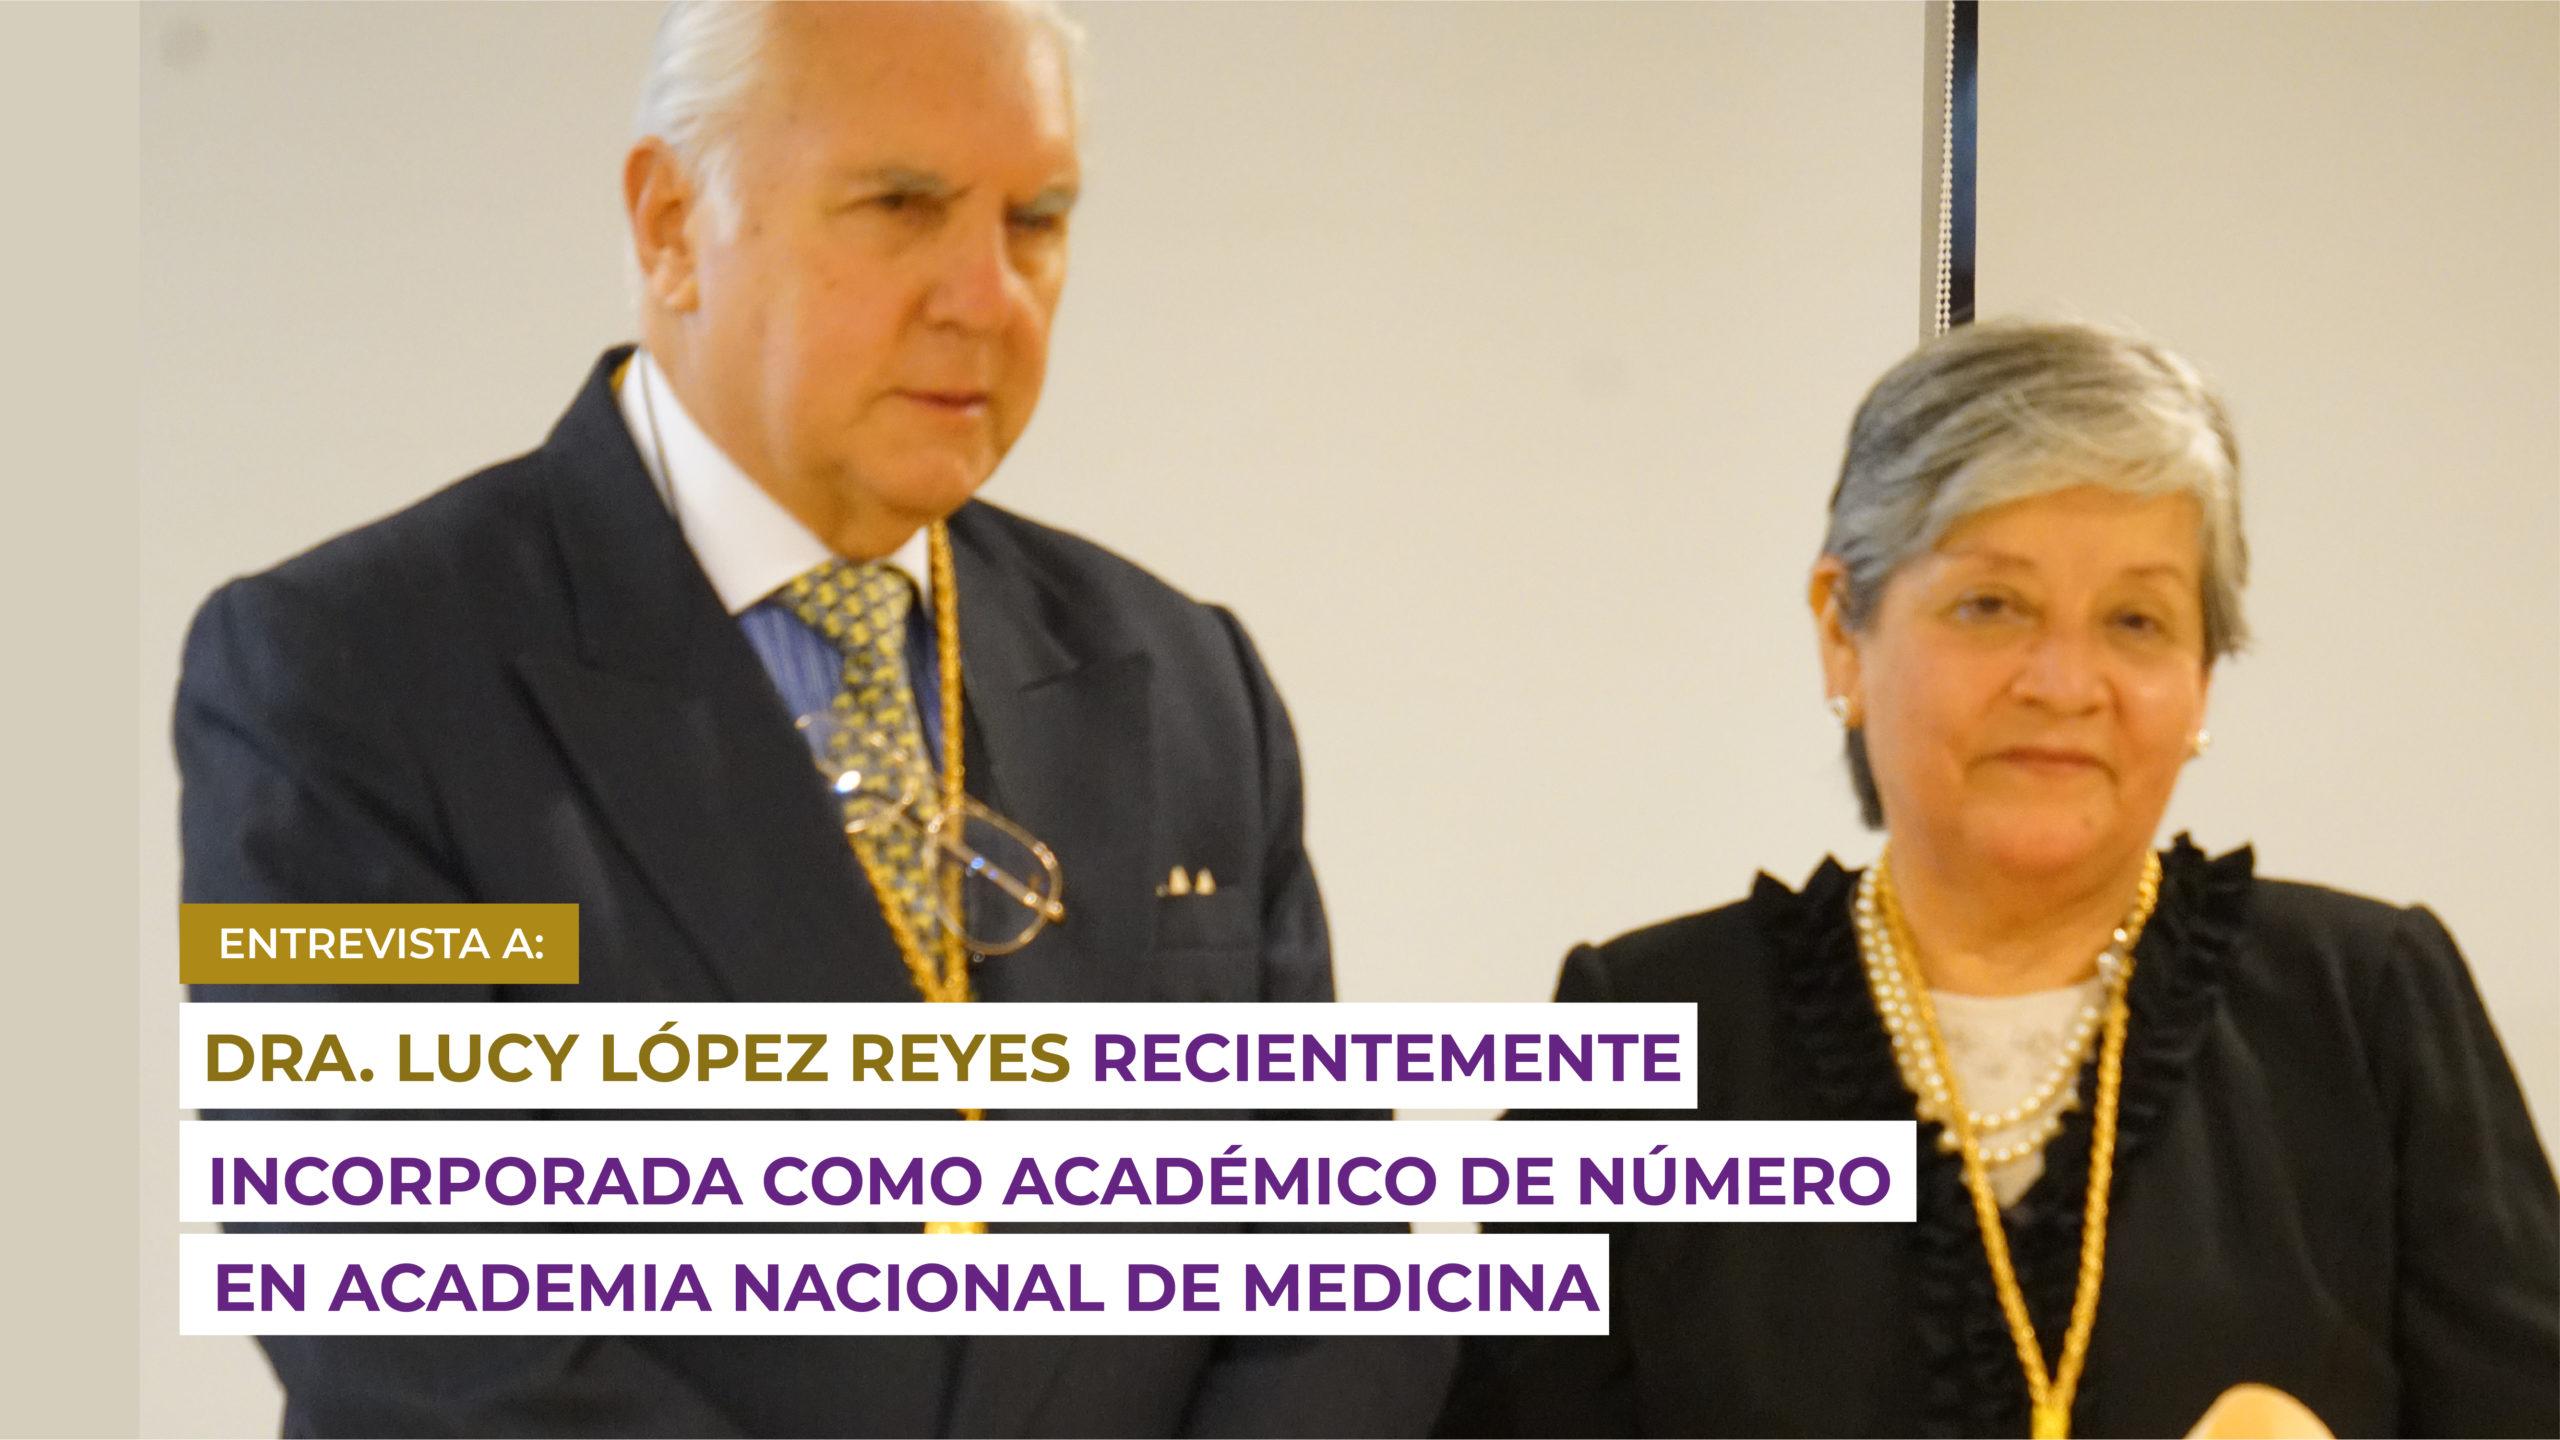 Dra. Lucy López Reyes recientemente incorporada como Académico de Número en Academia Nacional de Medicina